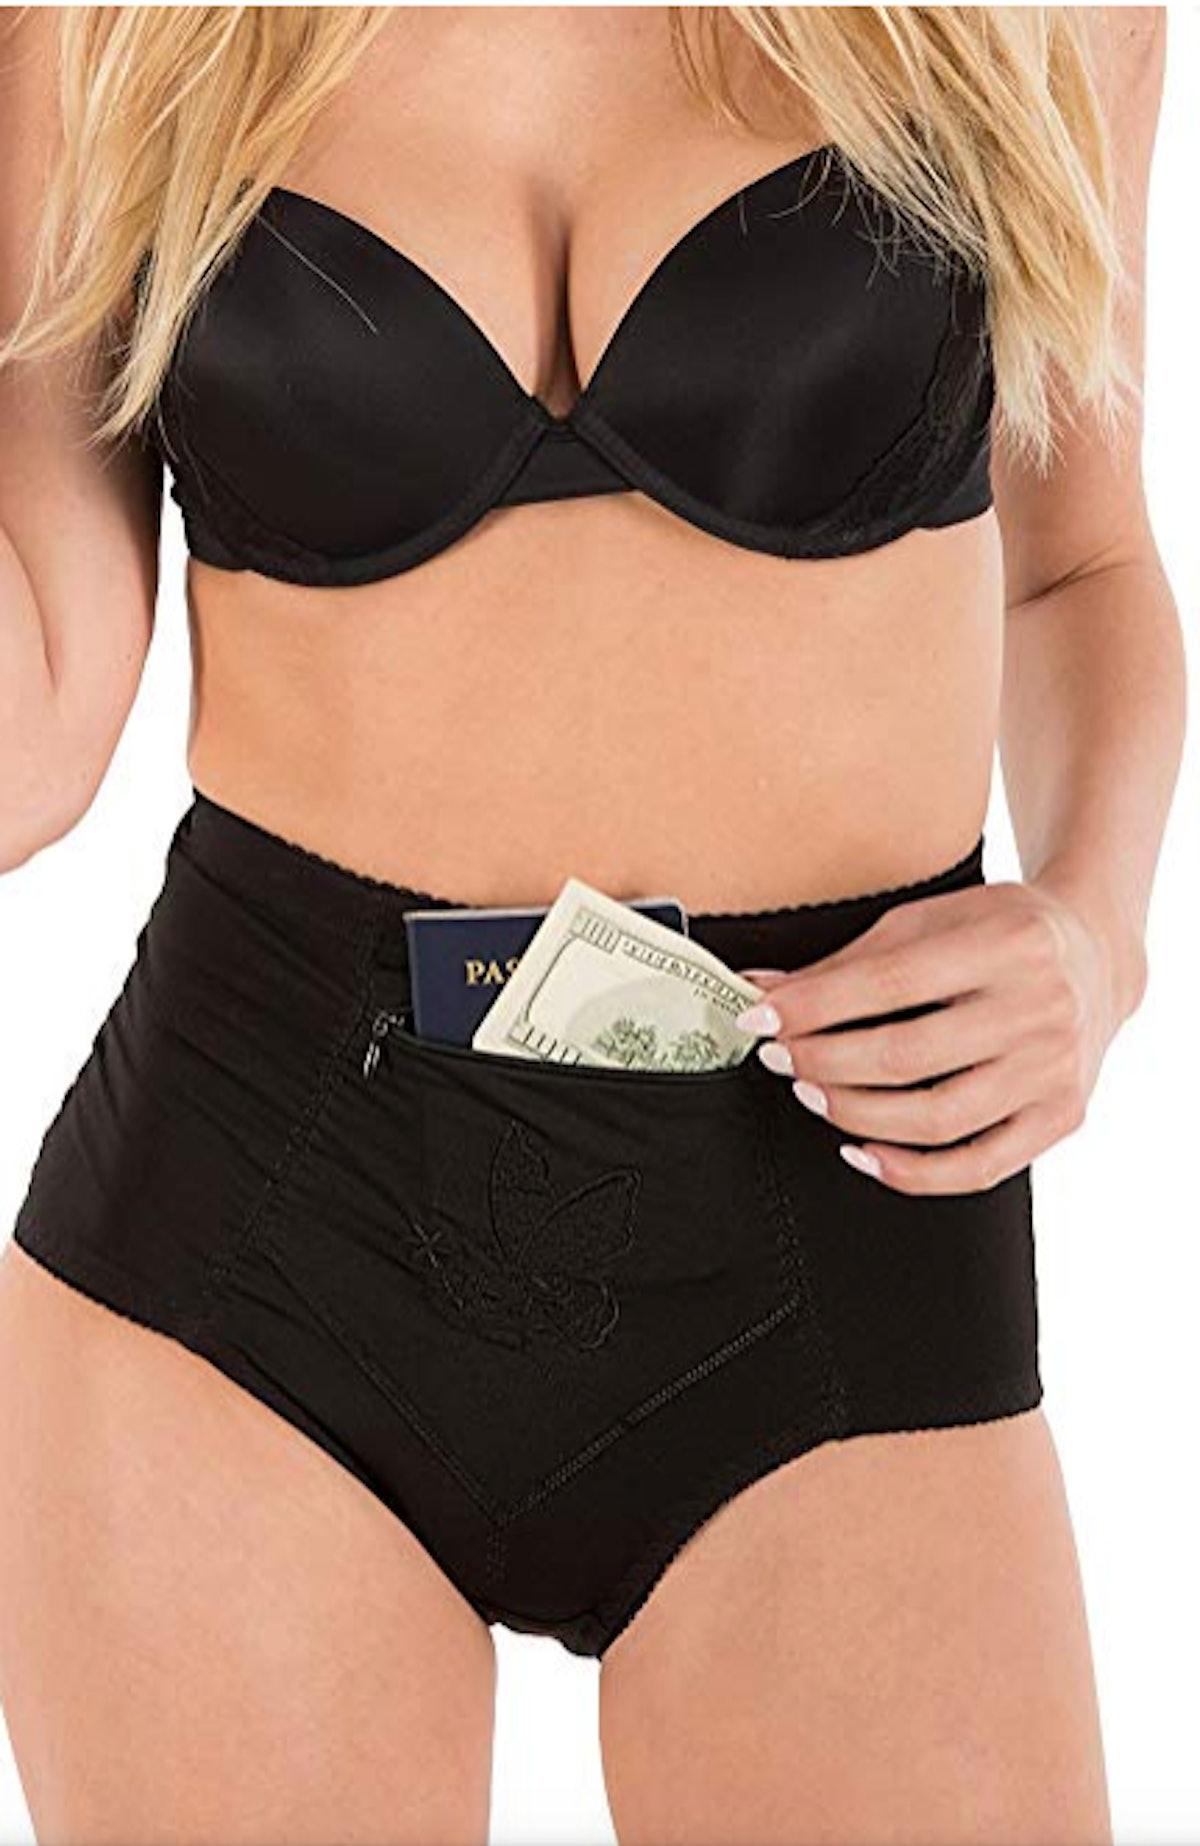 Barbra's Travel Pocket Underwear (6-Pack)